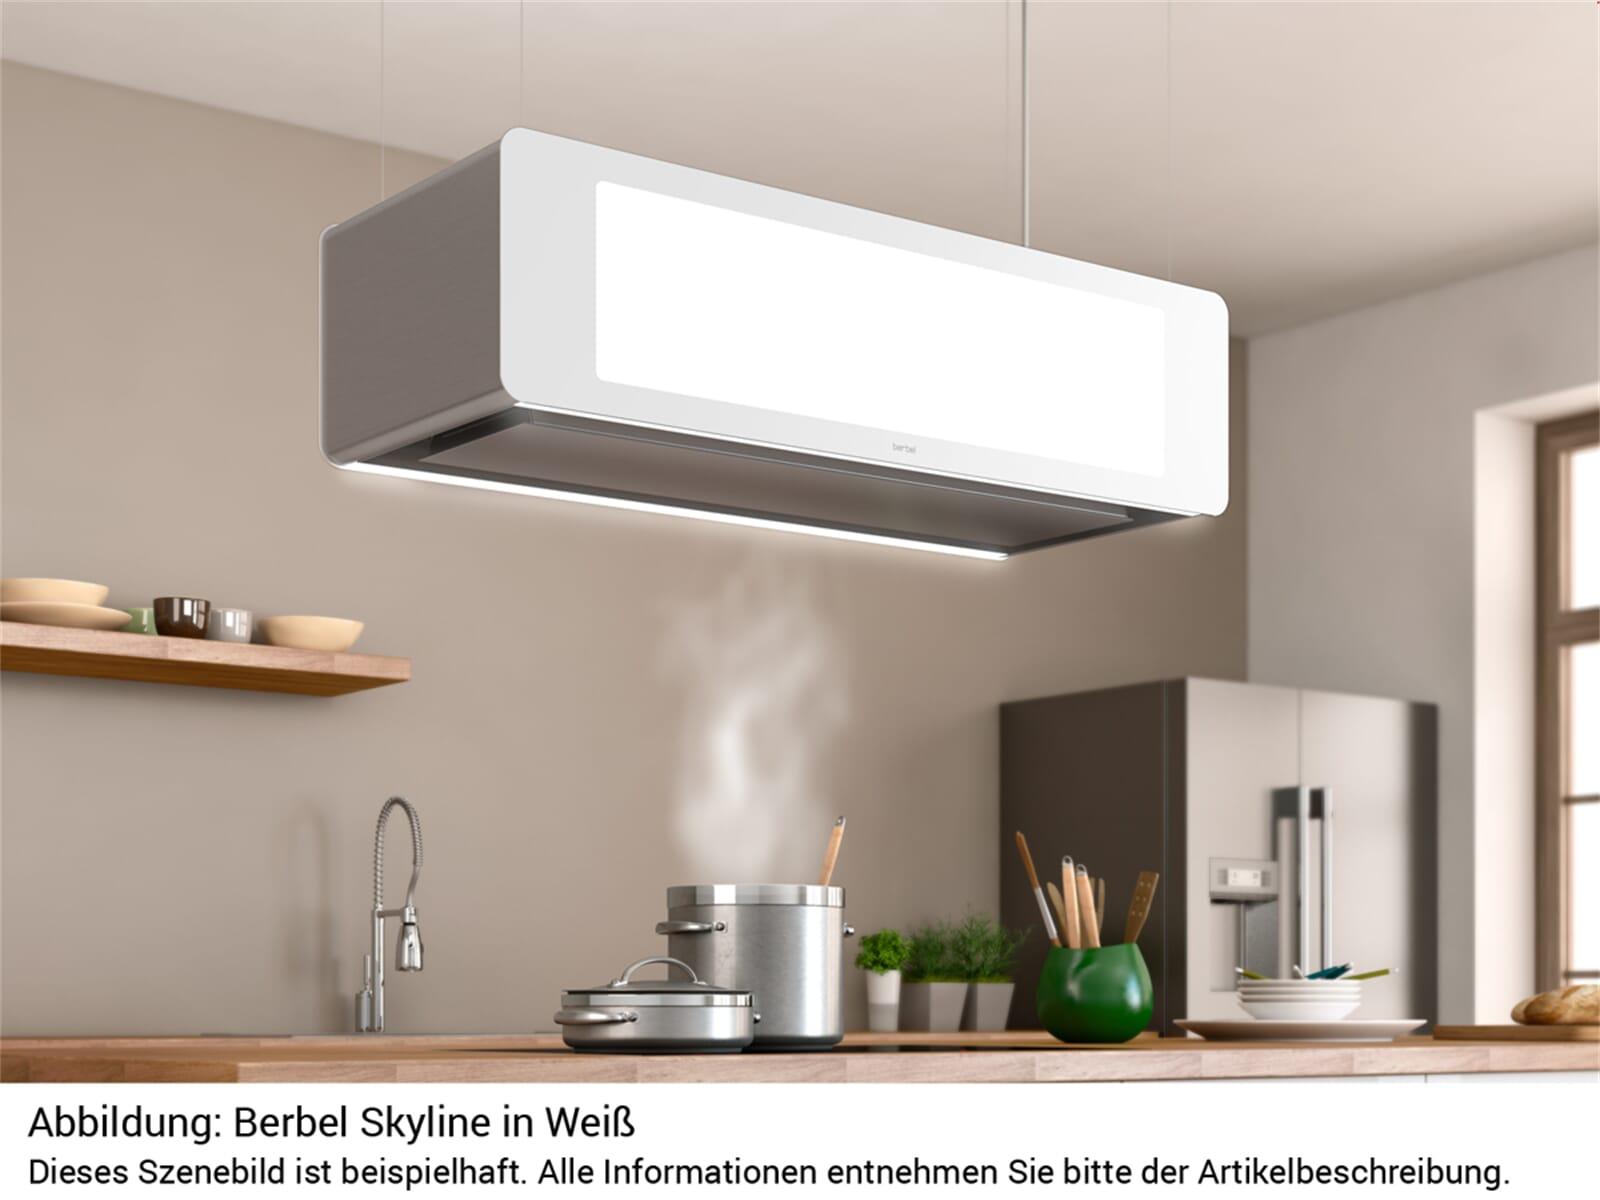 Berbel Skyline BDL 115 SK Deckenlifthaube Weiß